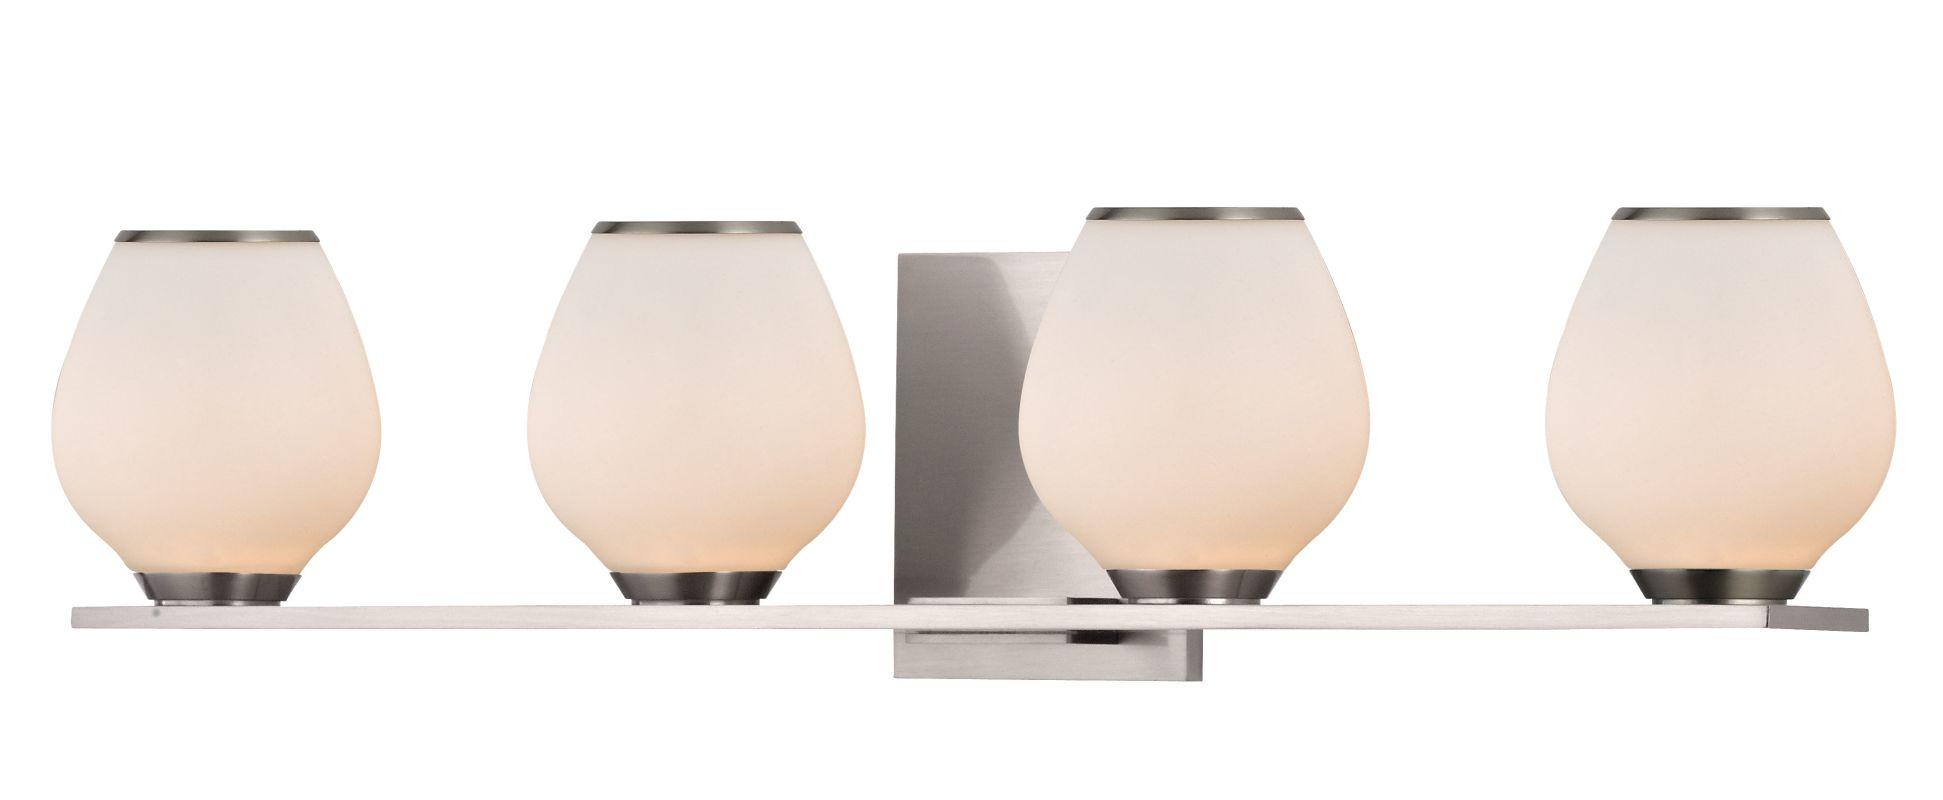 Hudson Valley Lighting 1194 Verona 4 Light Xenon Bathroom Vanity Light Sale $193.60 ITEM: bci2295068 ID#:1194-SN UPC: 806134158903 :